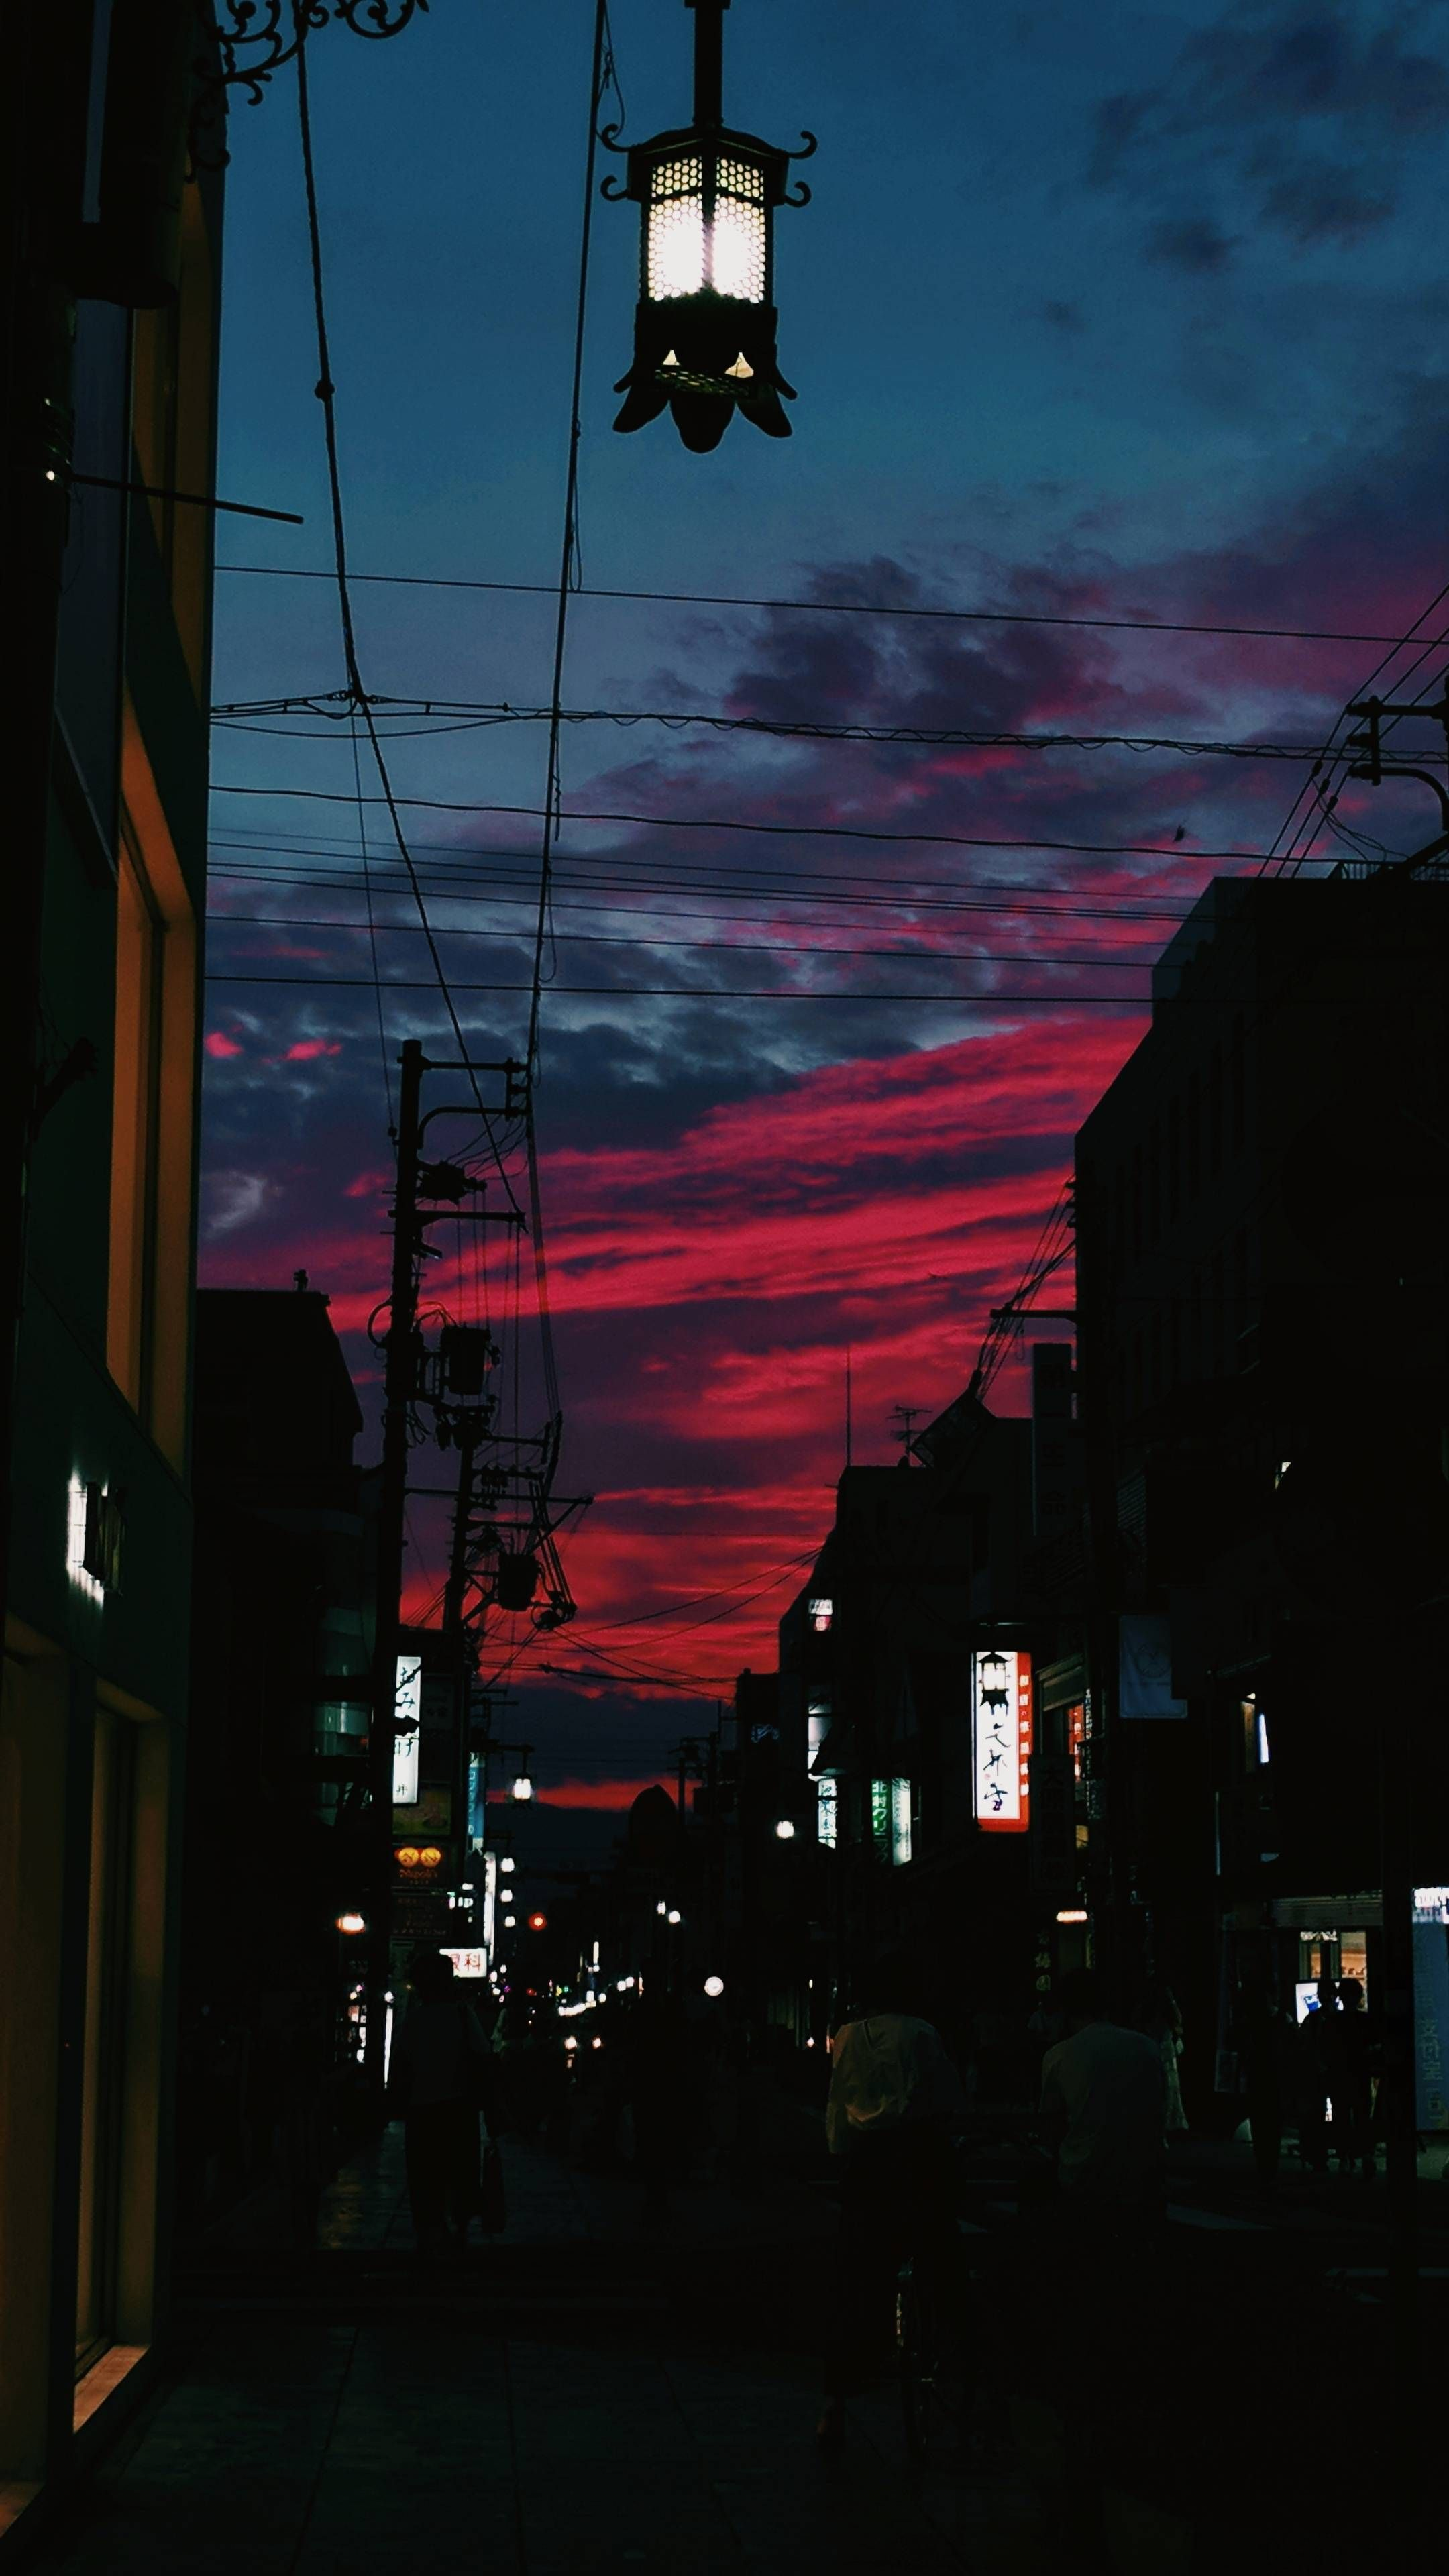 OC][2160x3840] Todays sunset was crazy in Nara Japan 2160x3840